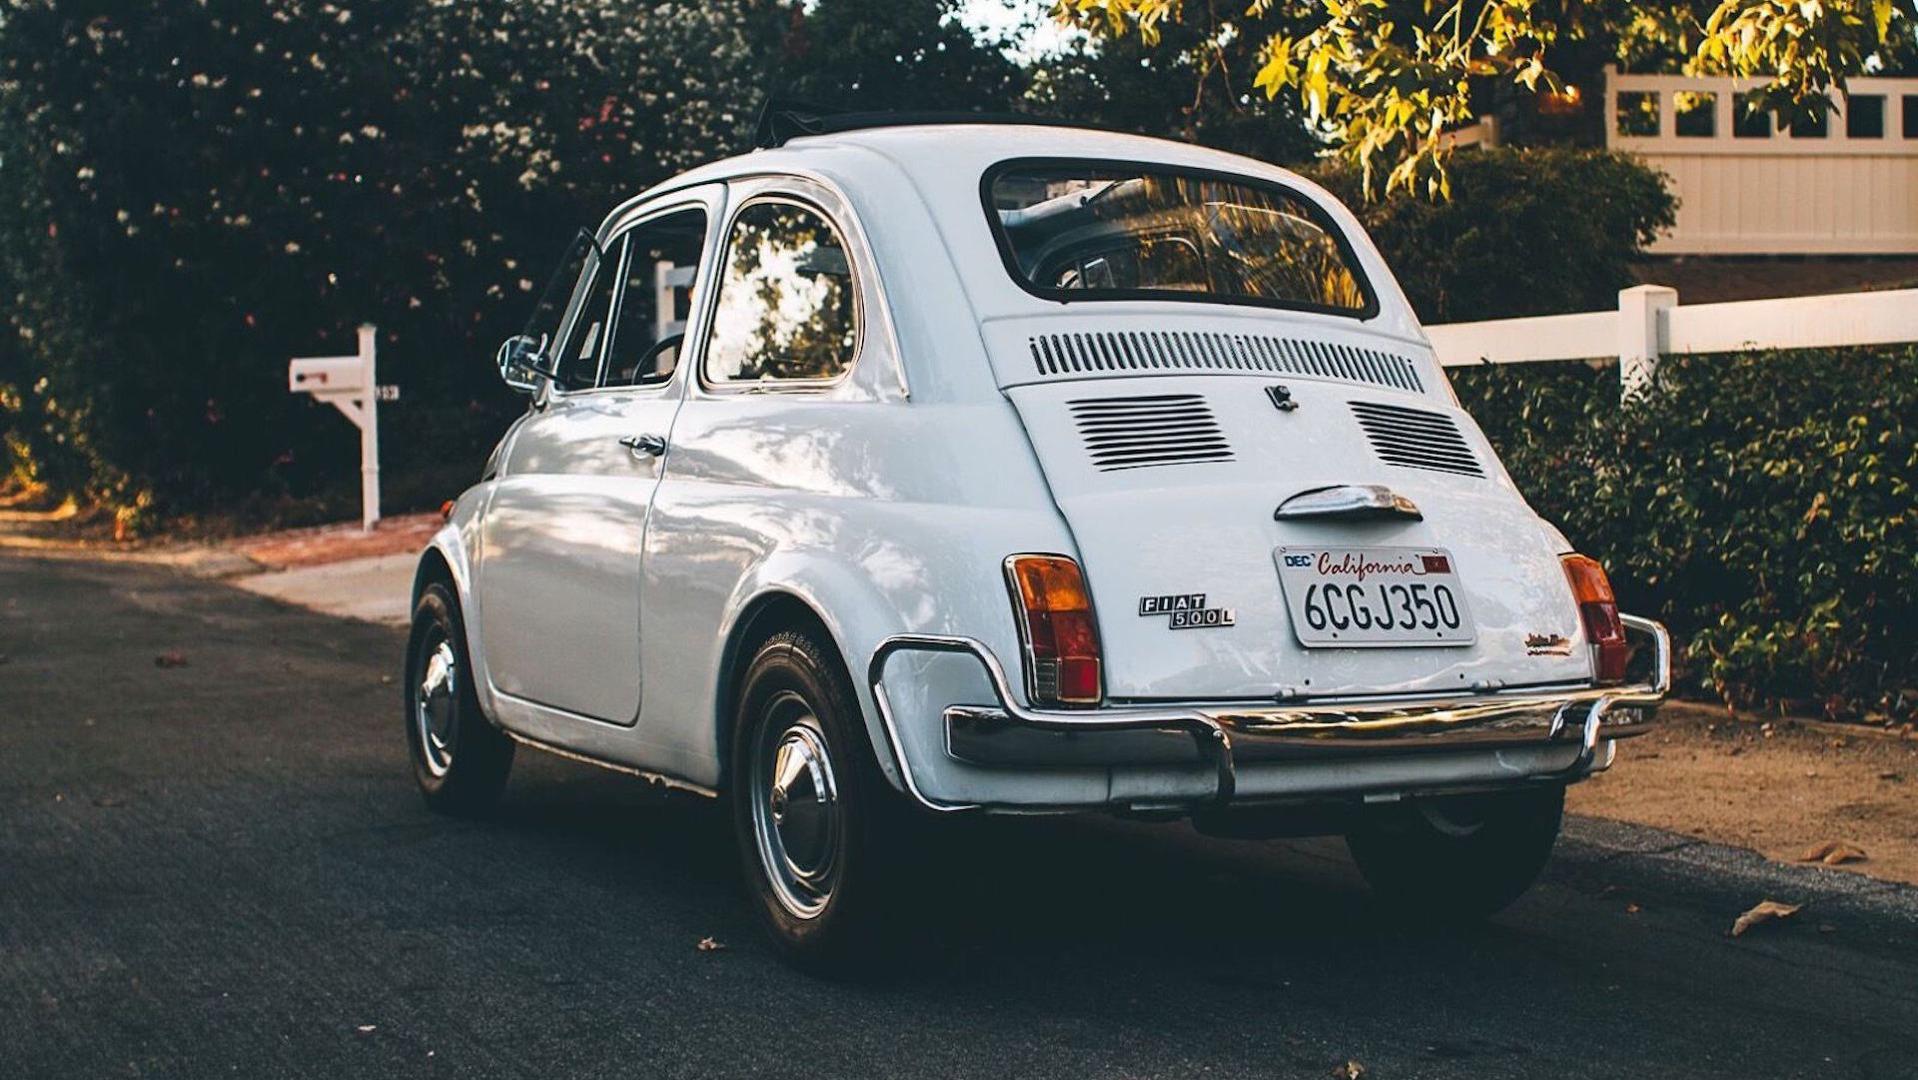 Restored 1971 Fiat 500 eBay find brings la pione